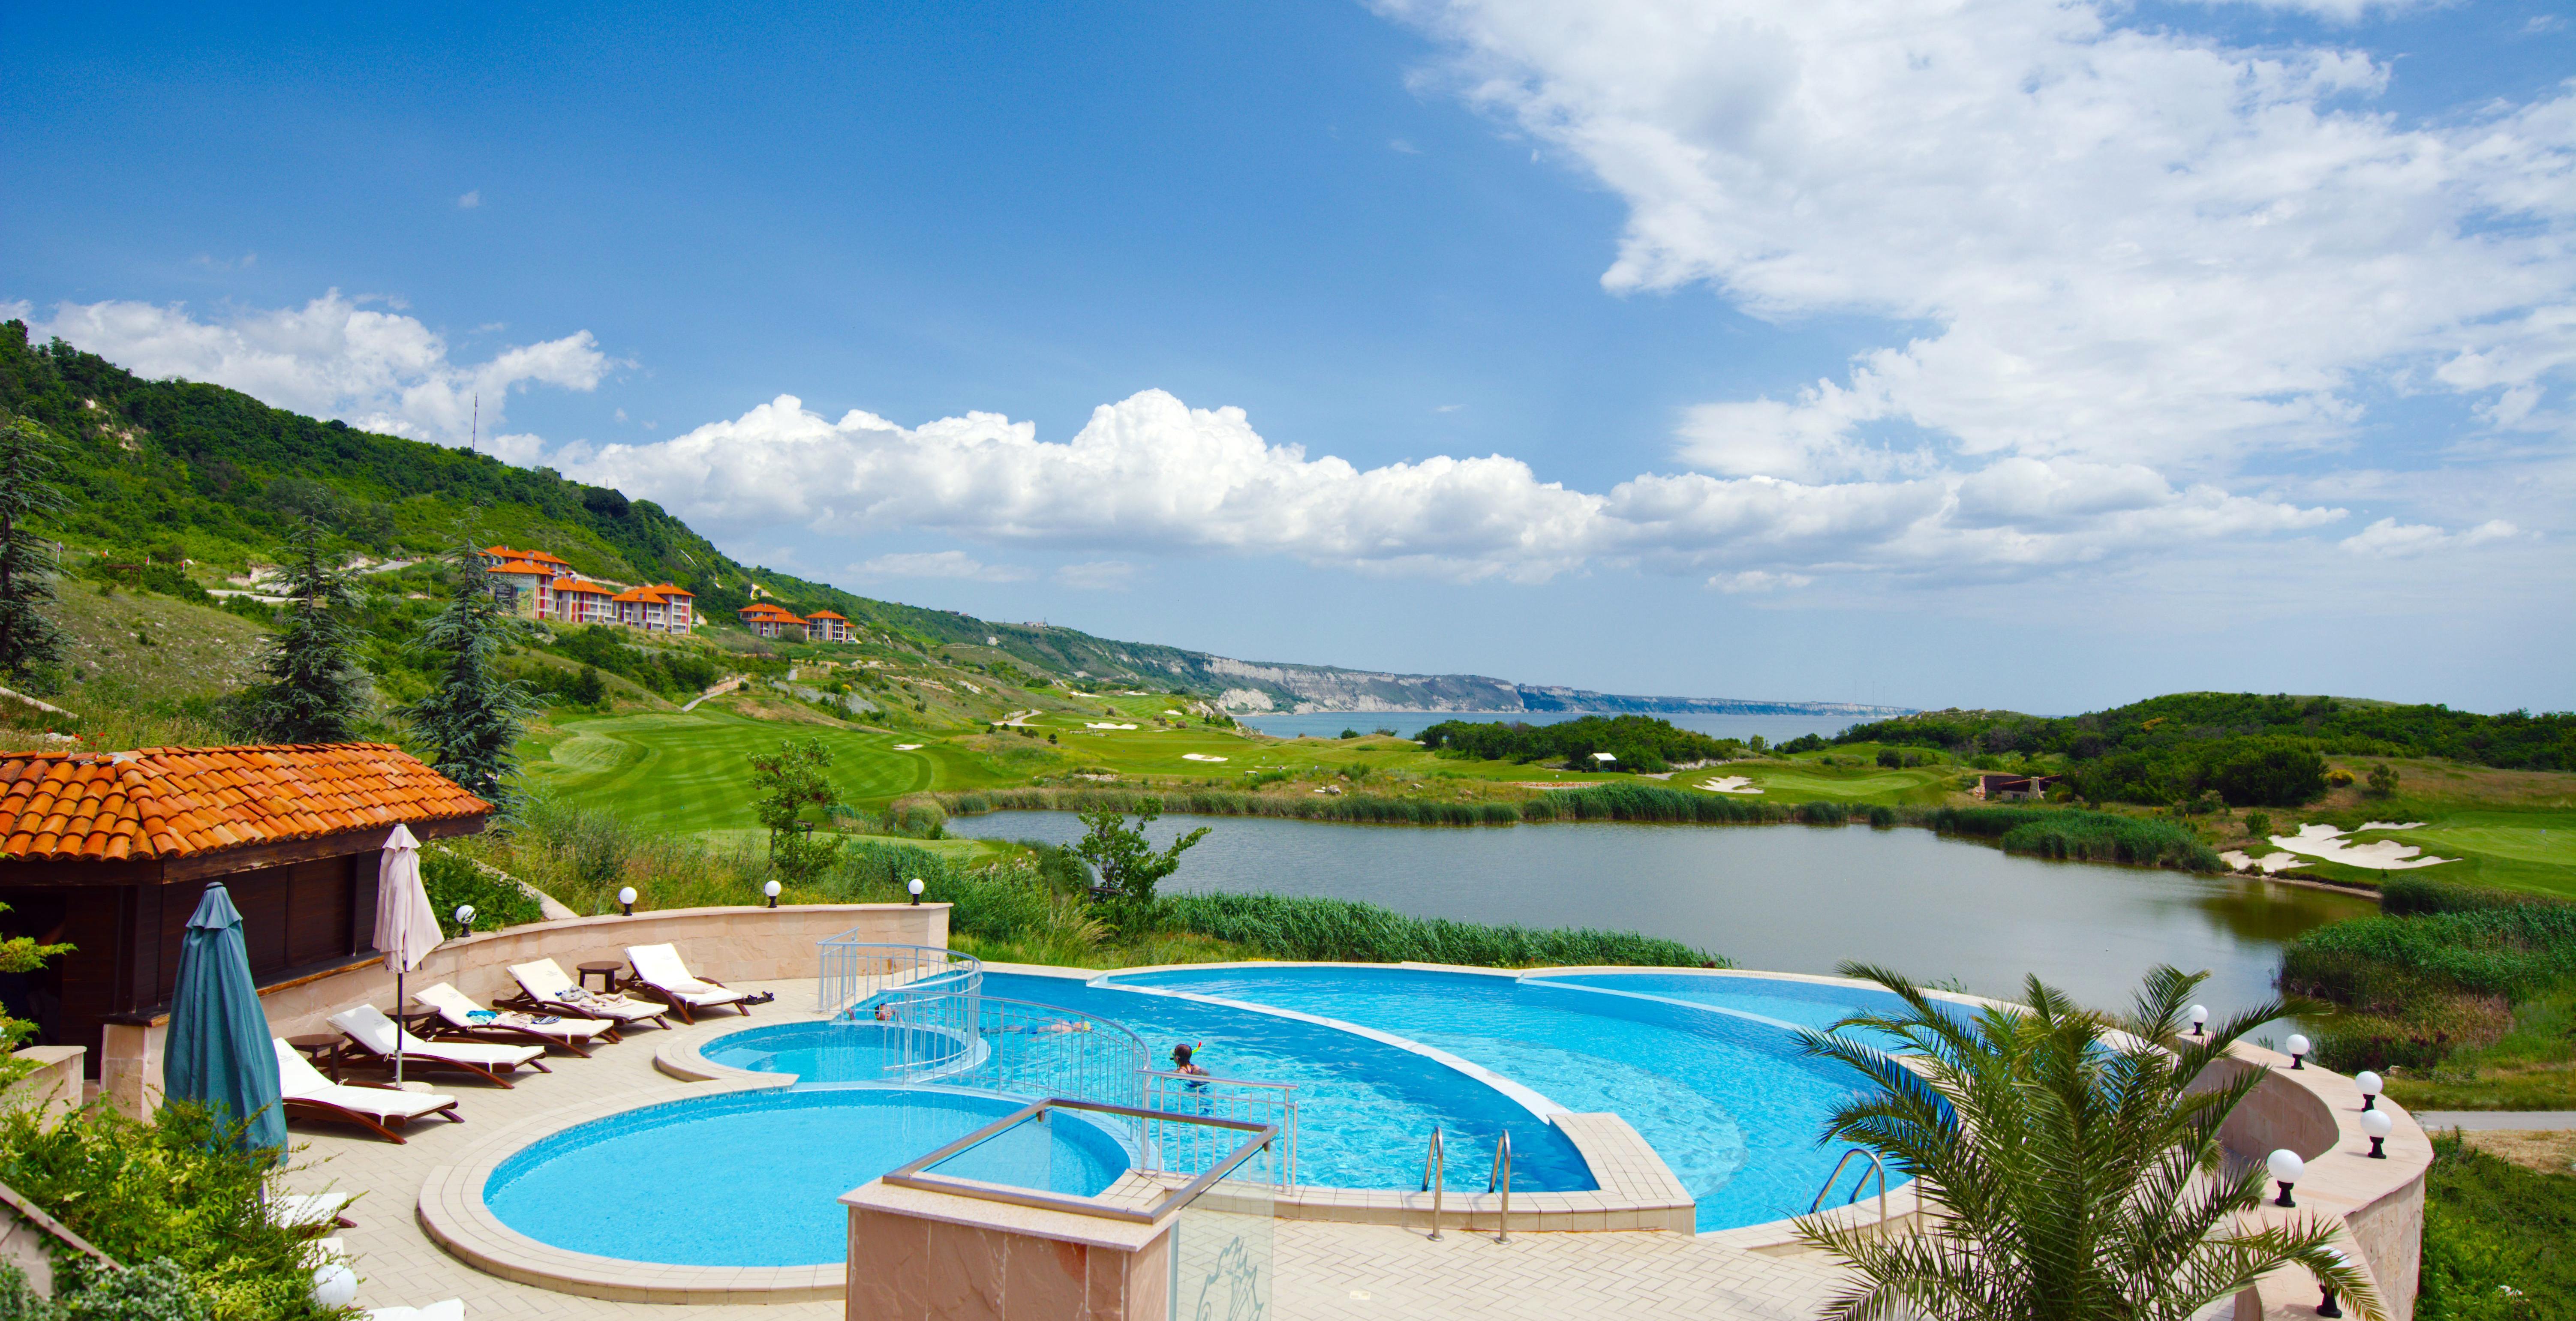 Golf-Bulharsko-Thracian-Cliffs-bazén-u-apartmánů